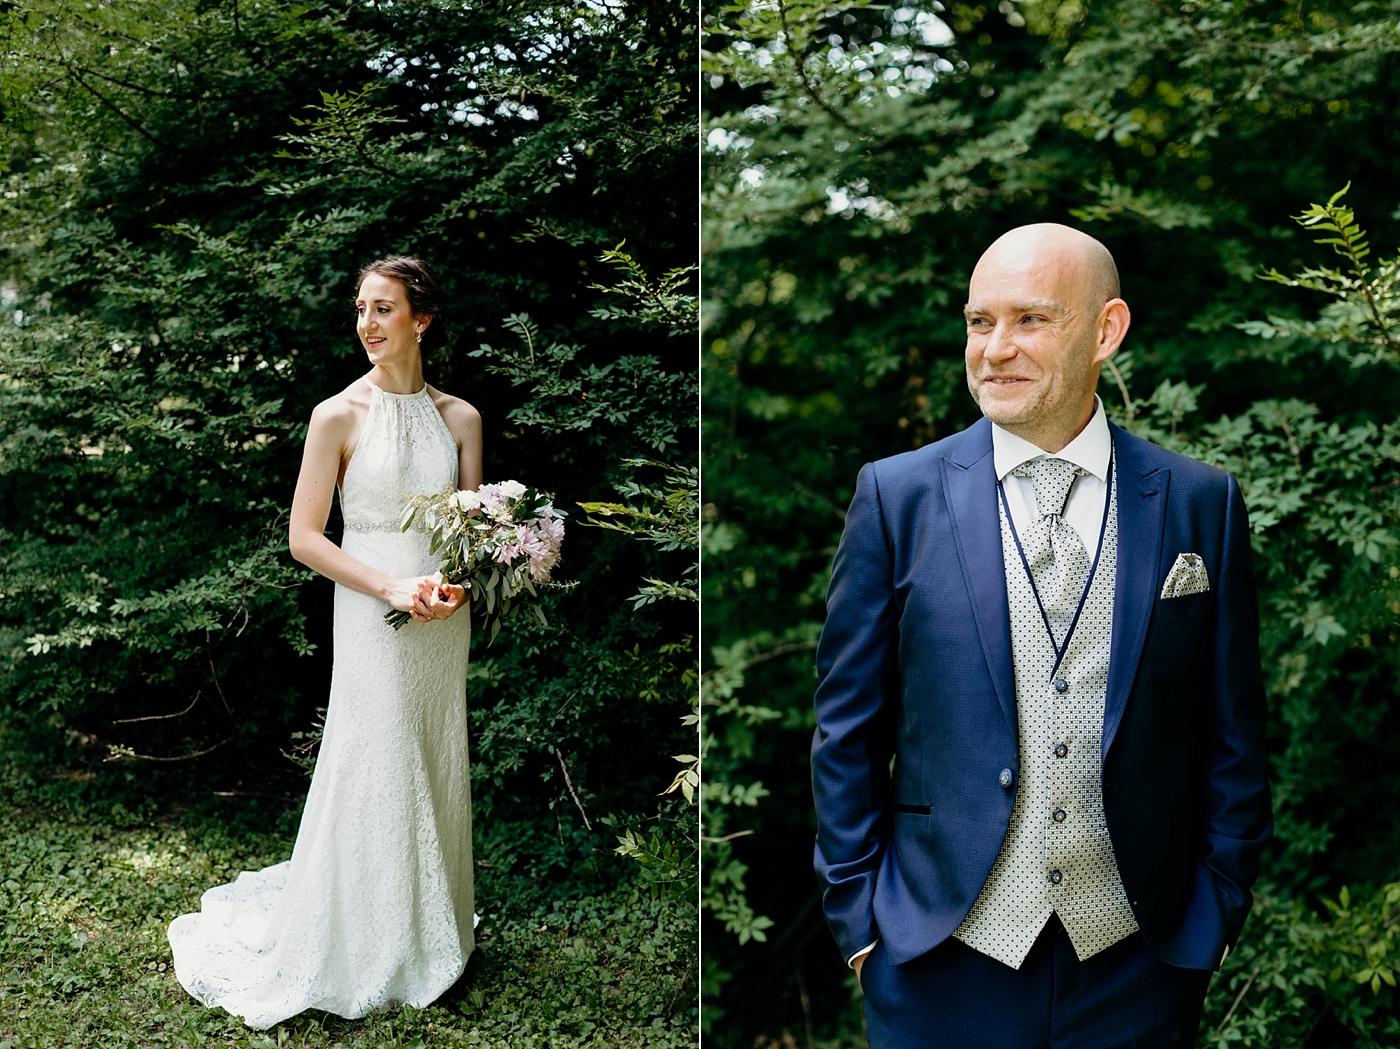 Chateau-Michelle-Wedding-Julia+JuanLuis_TheHeartlandersCo2018LA-106.jpg